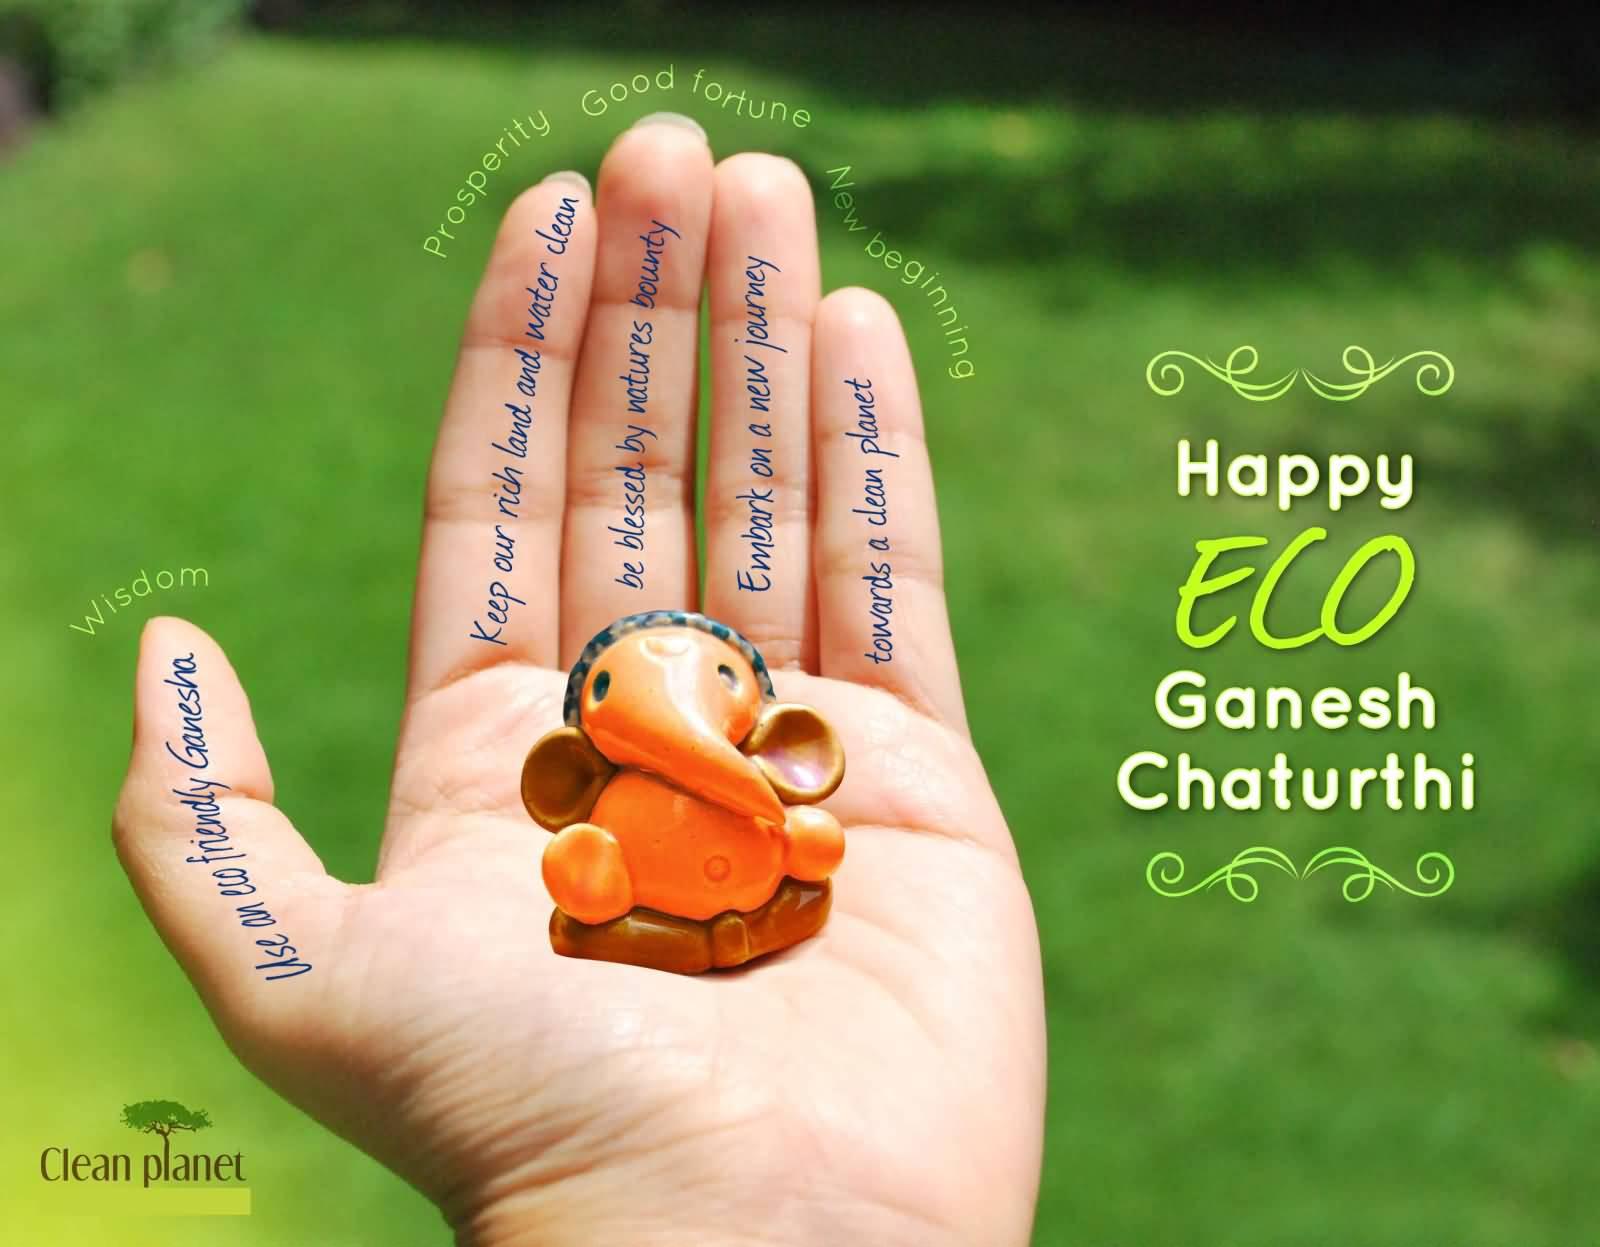 Vinayaka Chavithi Hd Wallpapers 65 Beautiful Happy Ganesh Chaturthi 2016 Greeting Pictures